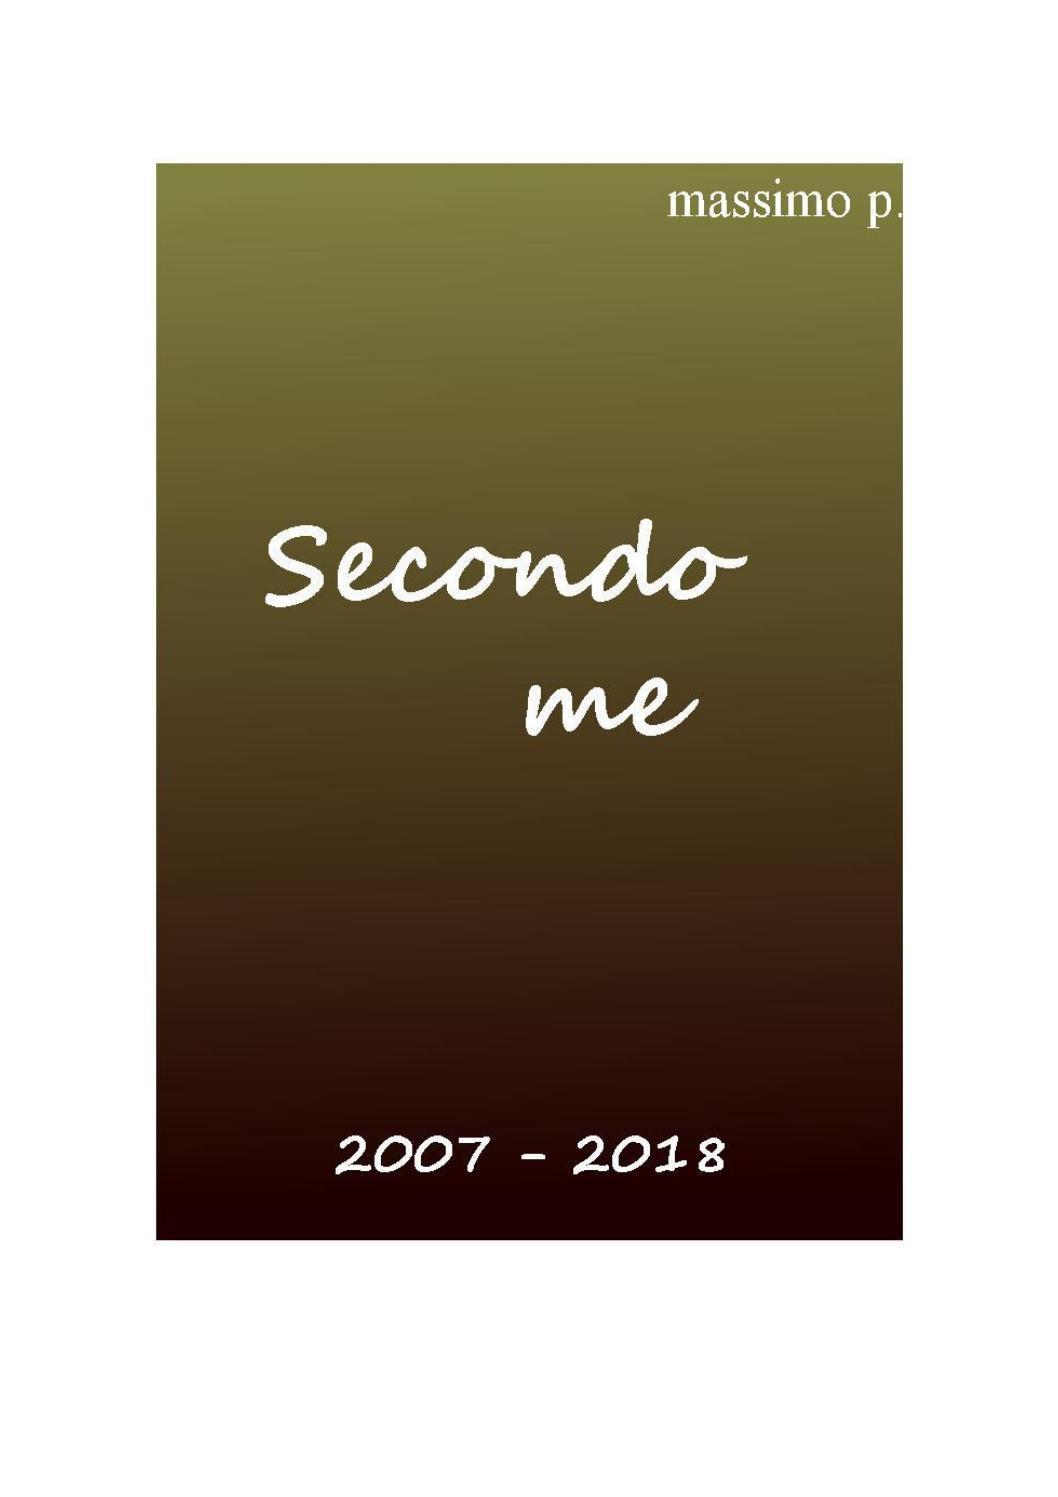 2f9f89dd07 Secondo me 2007-2018 by Massimo P. - issuu